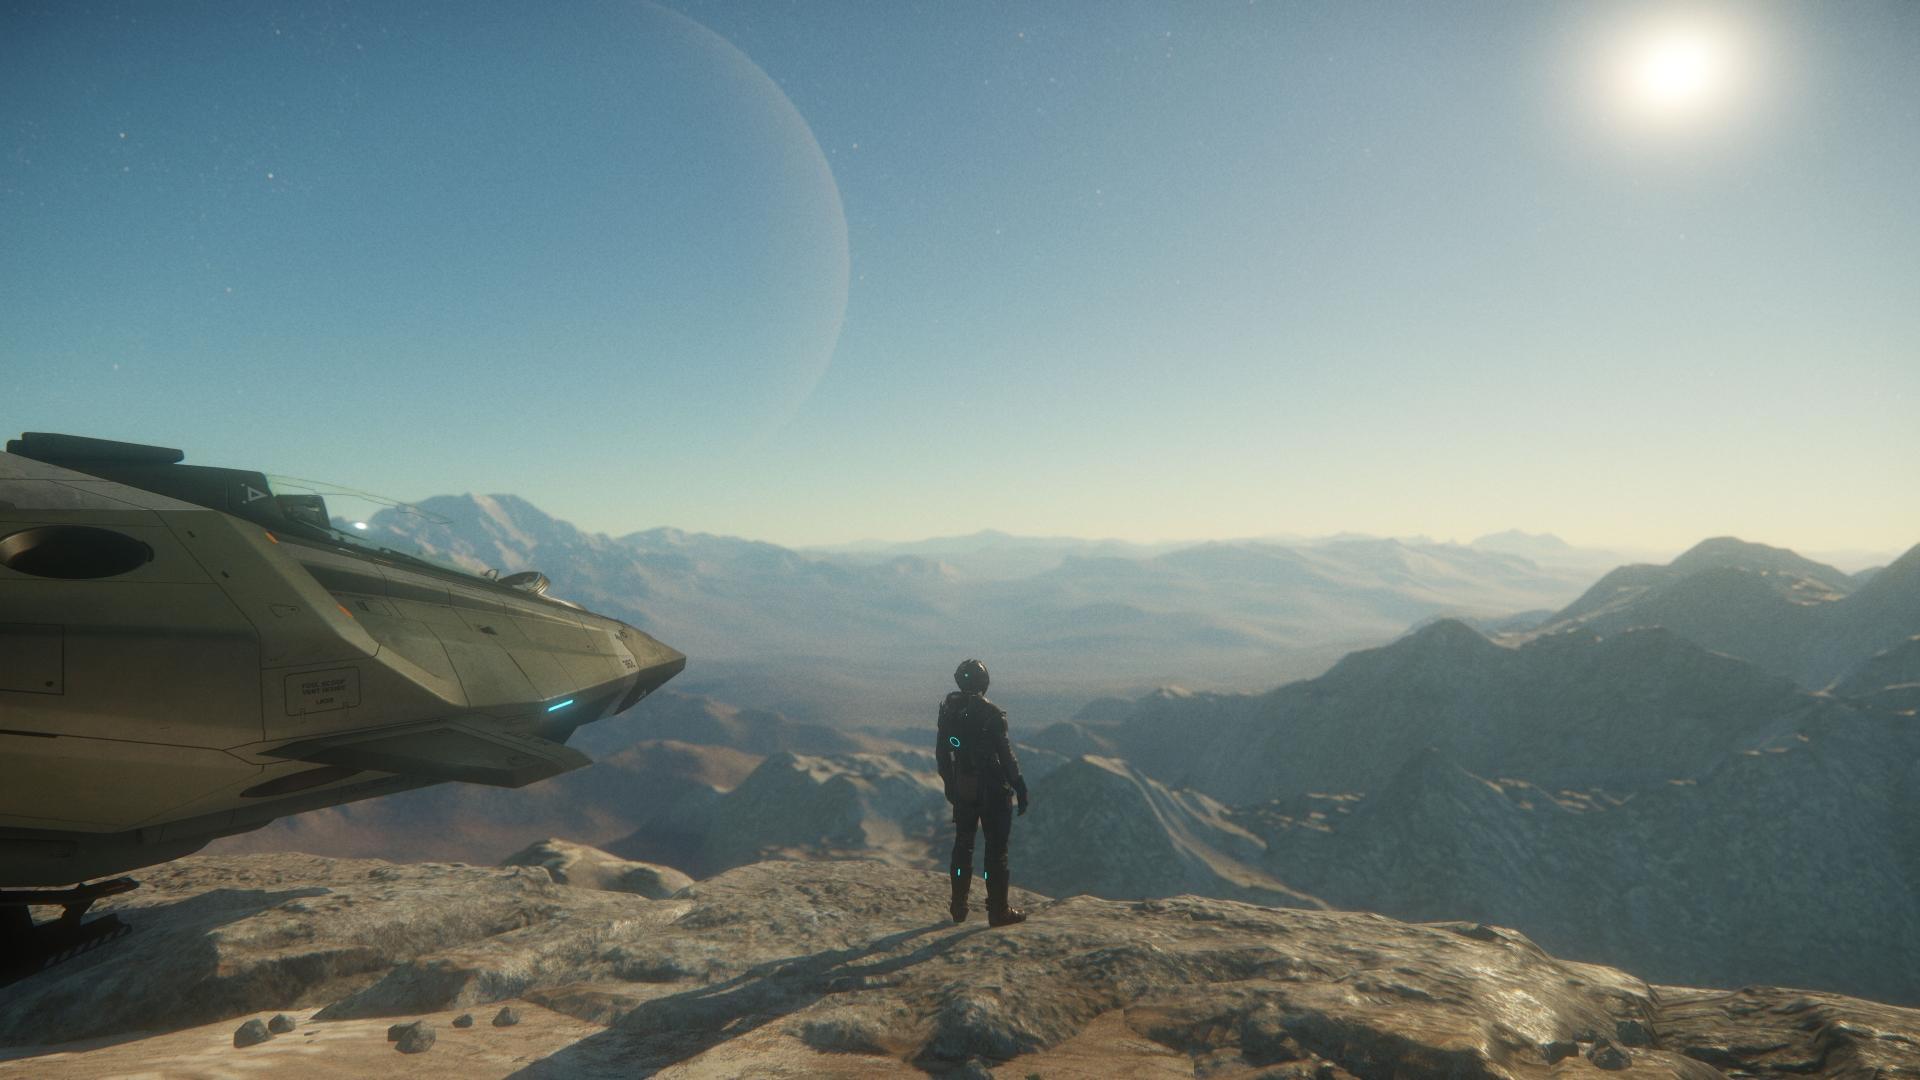 Aegis Gladius Landed On Planet In Game